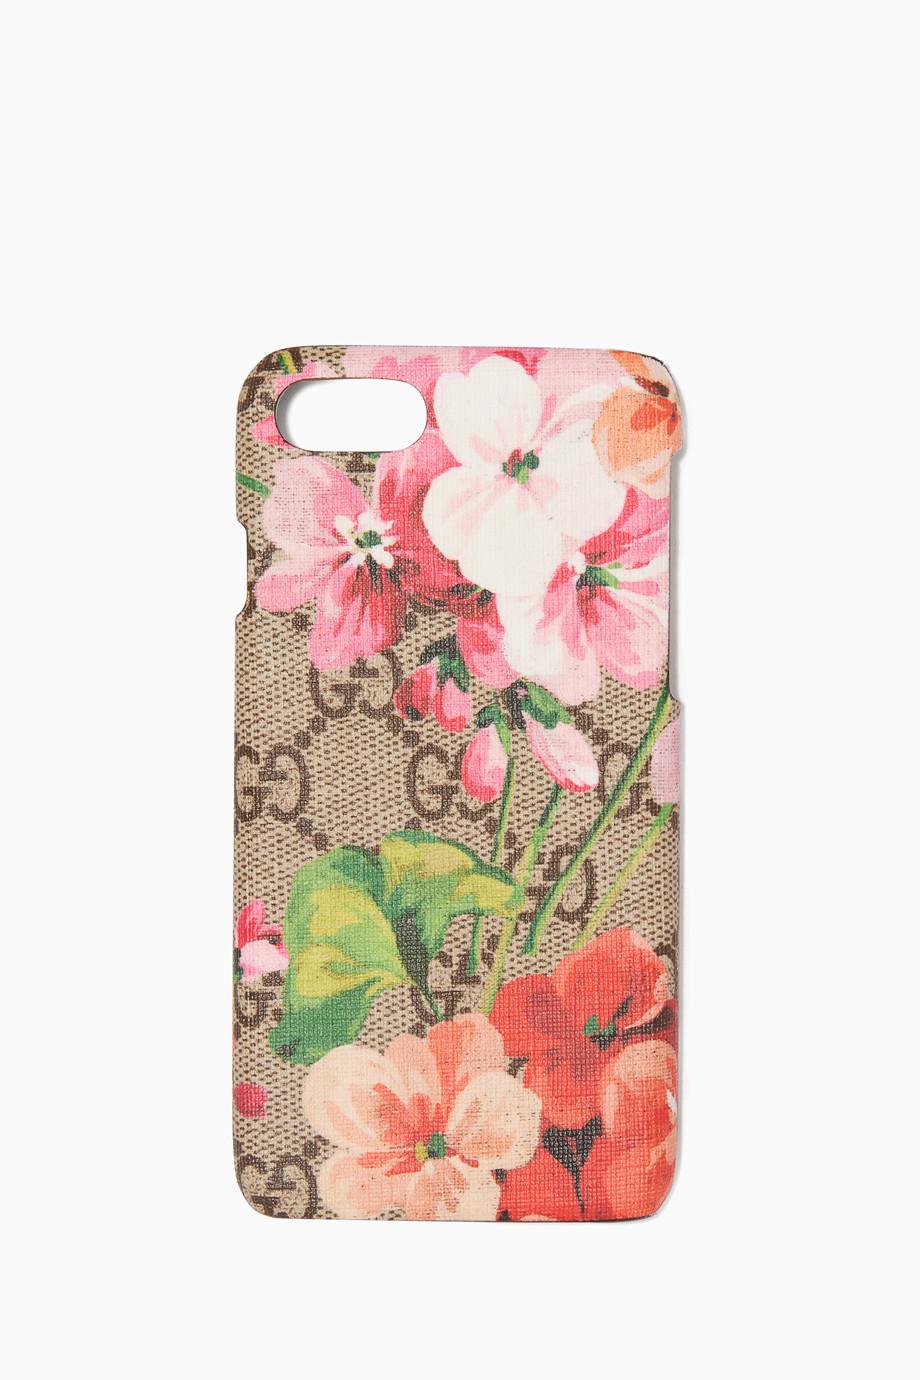 best website 842b5 5758e Shop Gucci Pink Beige GG Blooms iPhone® 7 Case for Women ...